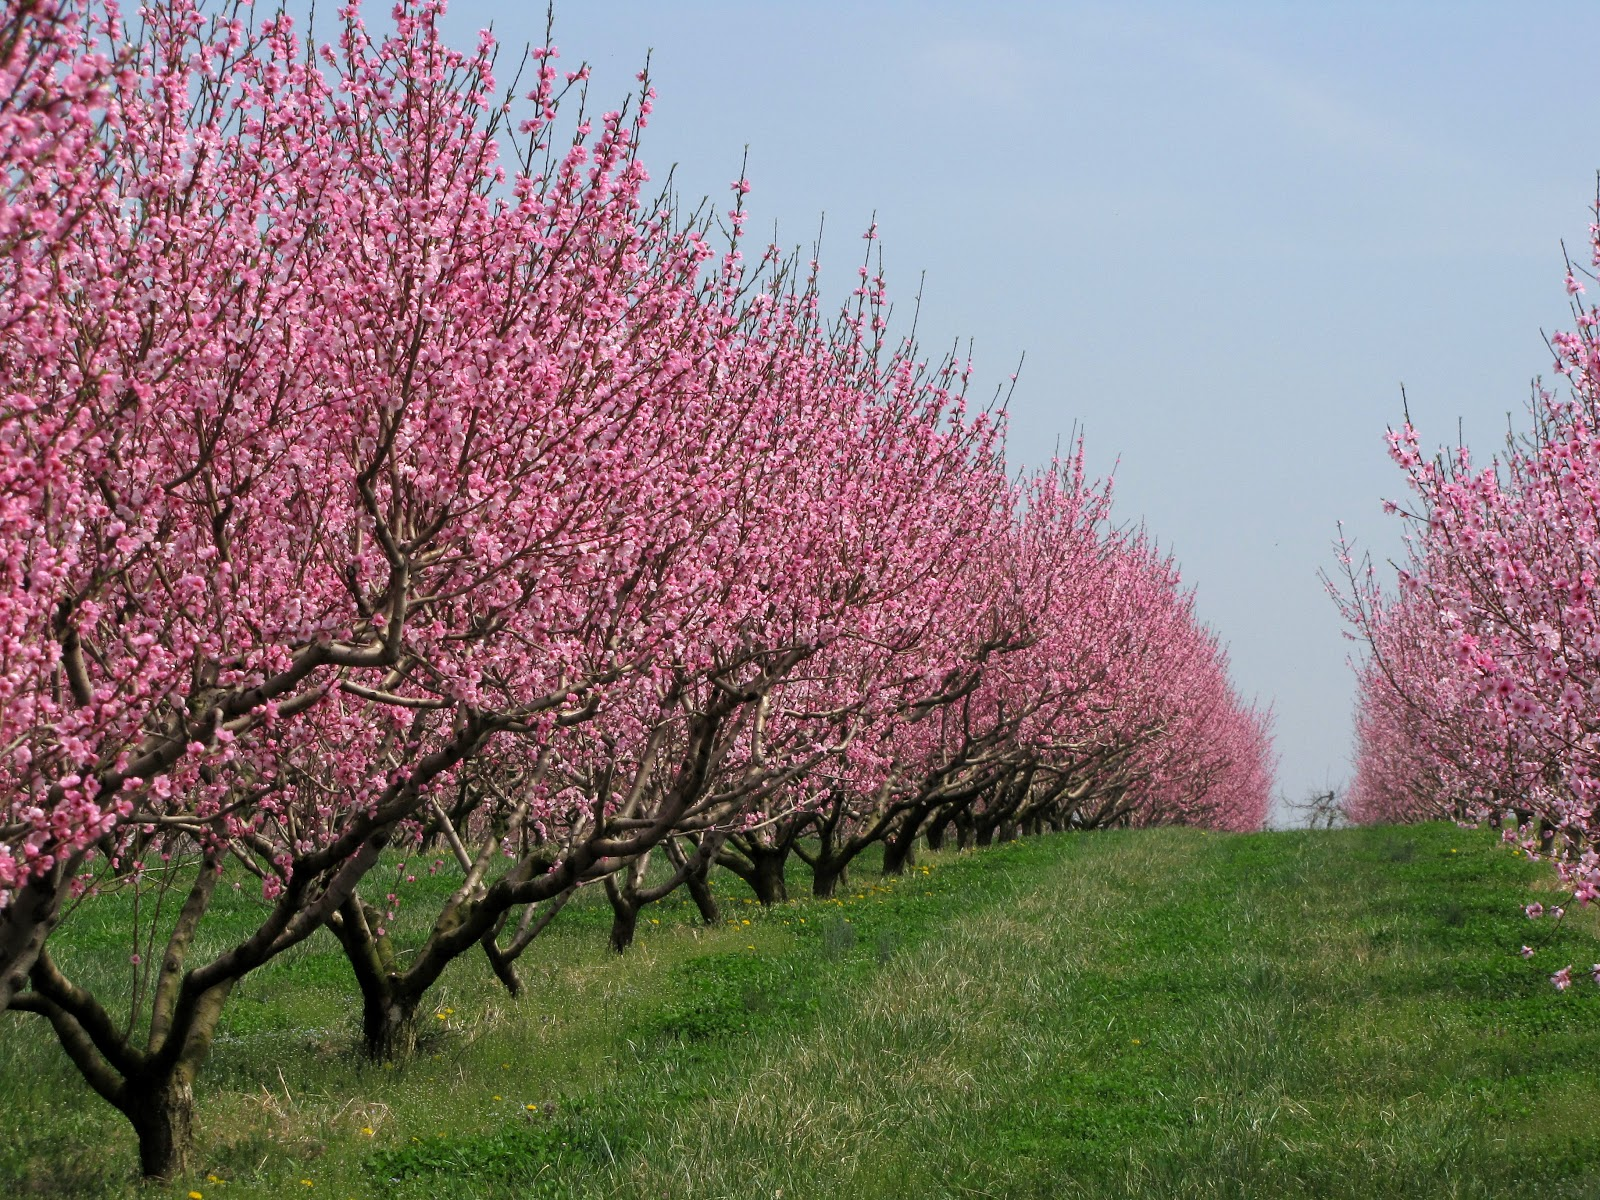 http://3.bp.blogspot.com/-MOXHDf5FaO8/UX2NH3-MQCI/AAAAAAAACLM/iax494T4XuY/s1600/Peach+orchard+blossoms+3.23.12+(3).JPG